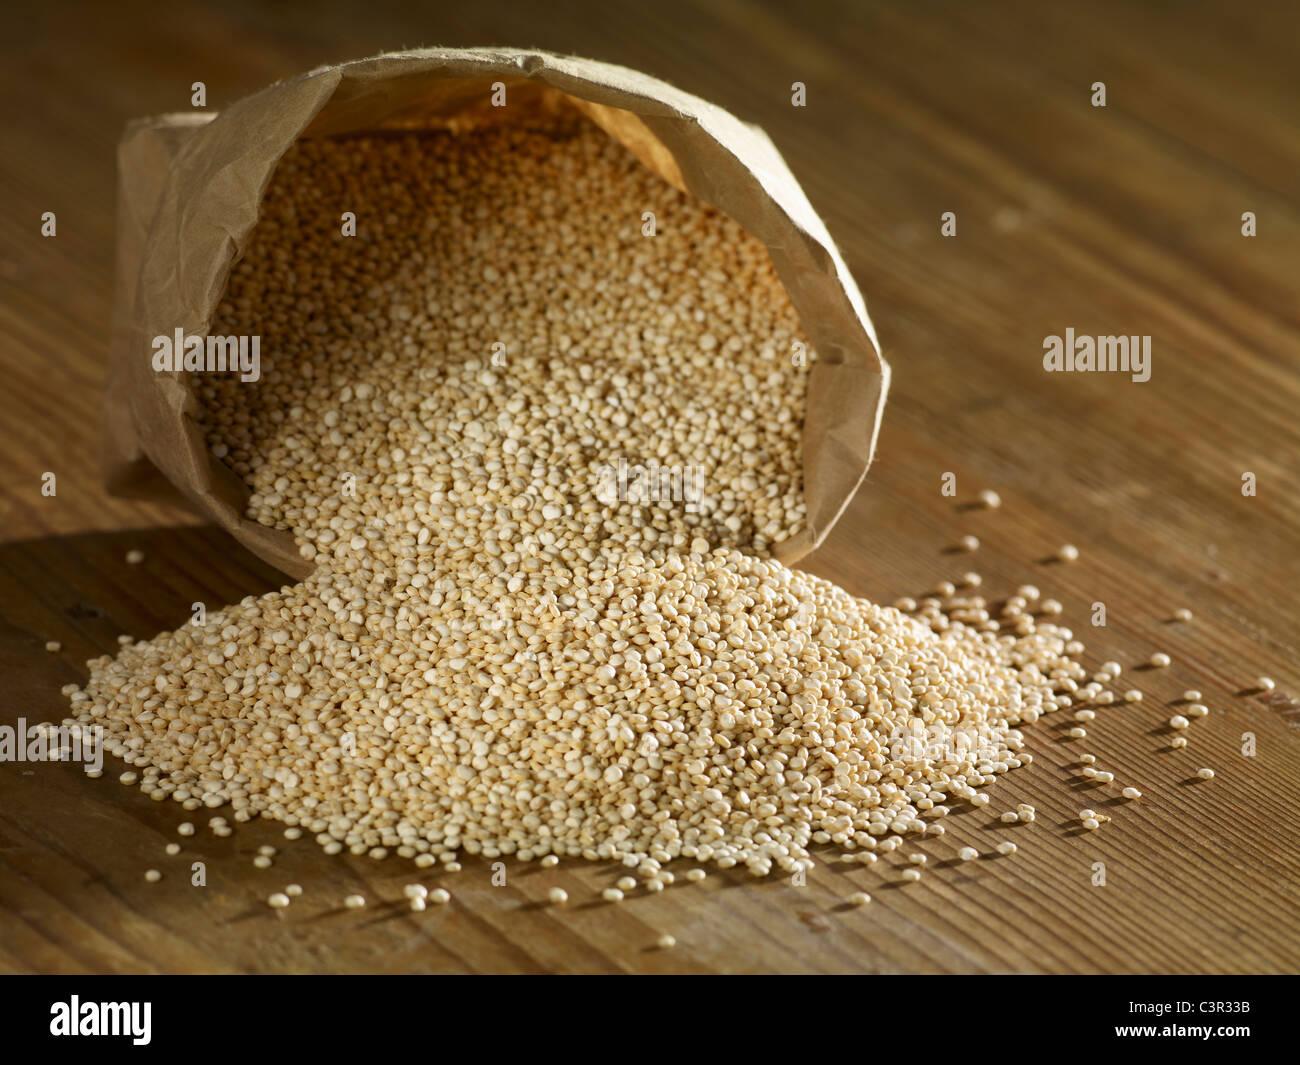 Quinoa grain spilling on wooden surface - Stock Image